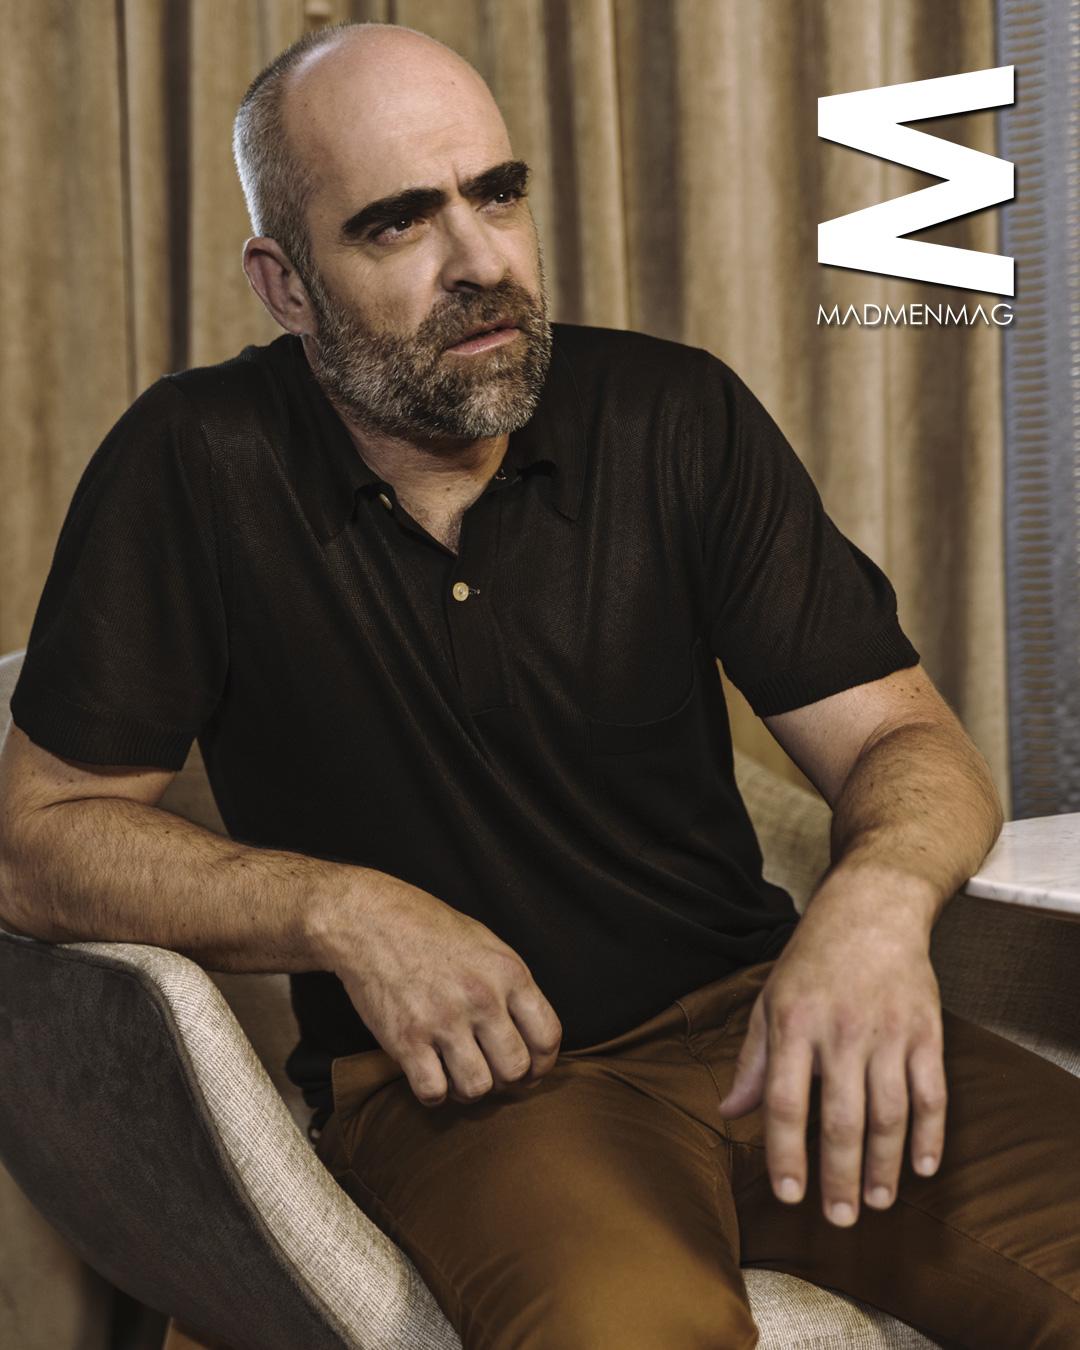 Luis-Tosar-MADMENMAG-Septiembre-2018-Vincent-Urbani-6